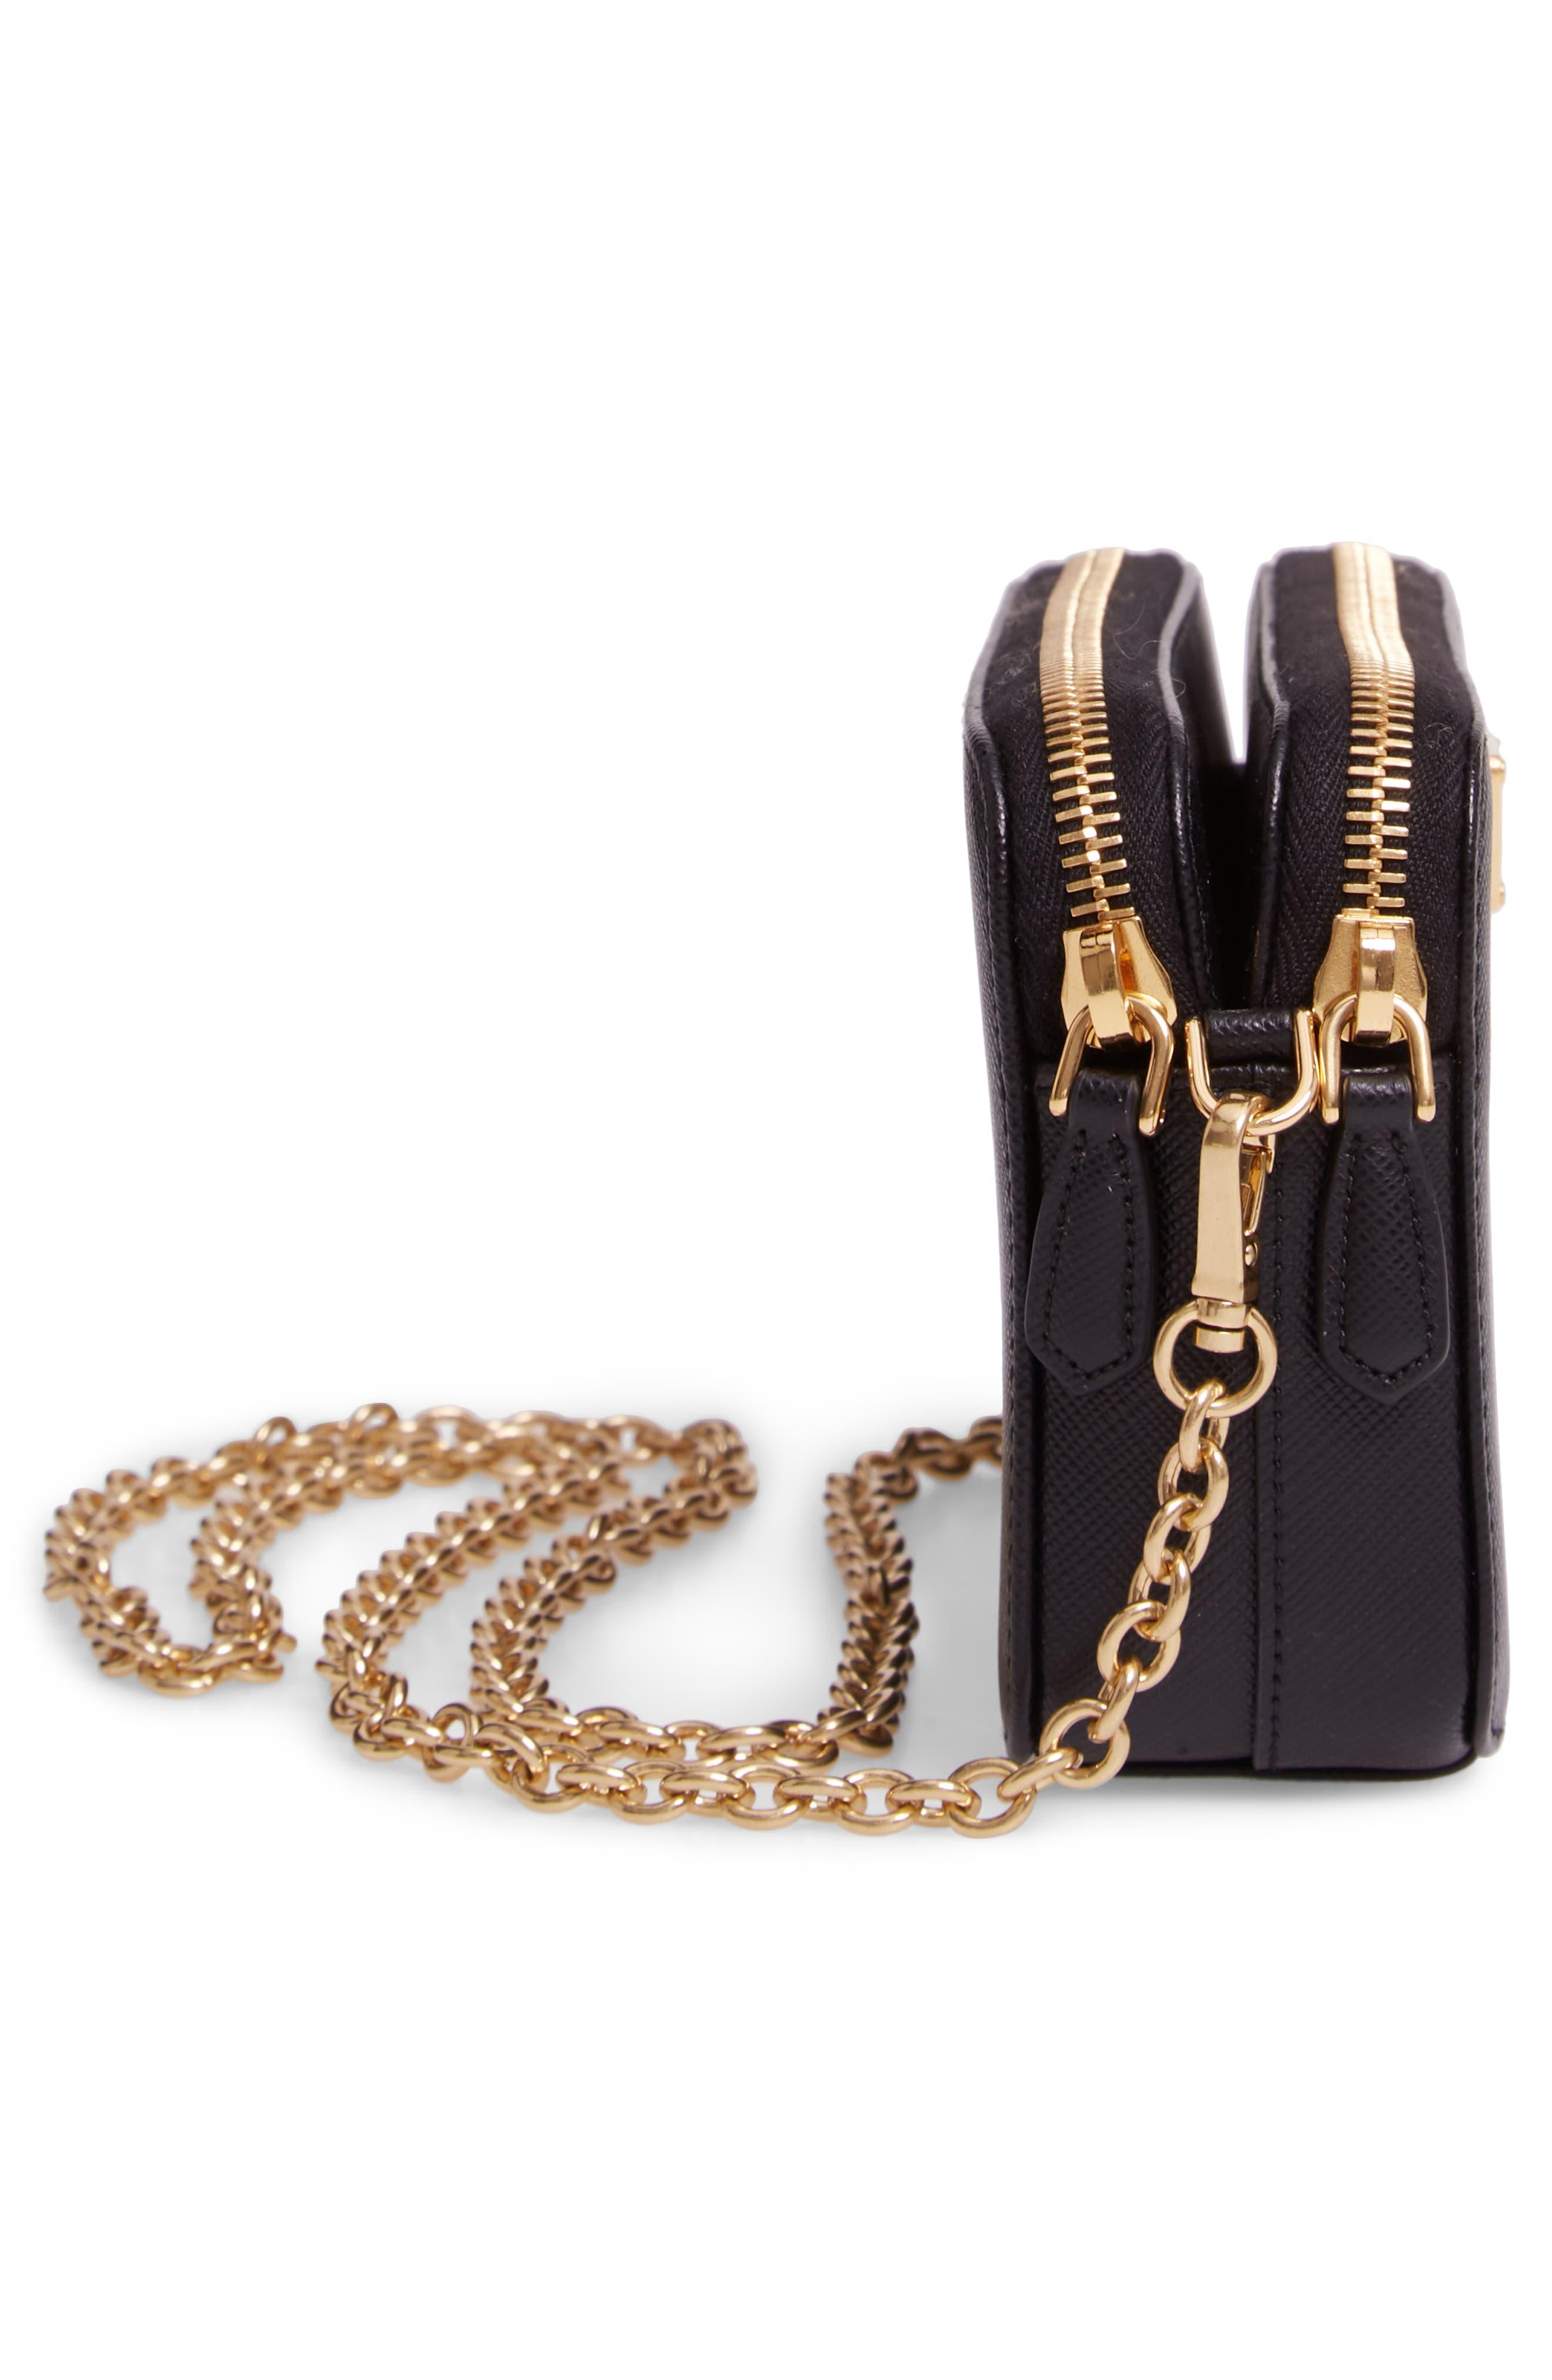 Small Double Compartment Zip Saffiano Leather Crossbody Bag,                             Alternate thumbnail 5, color,                             NERO